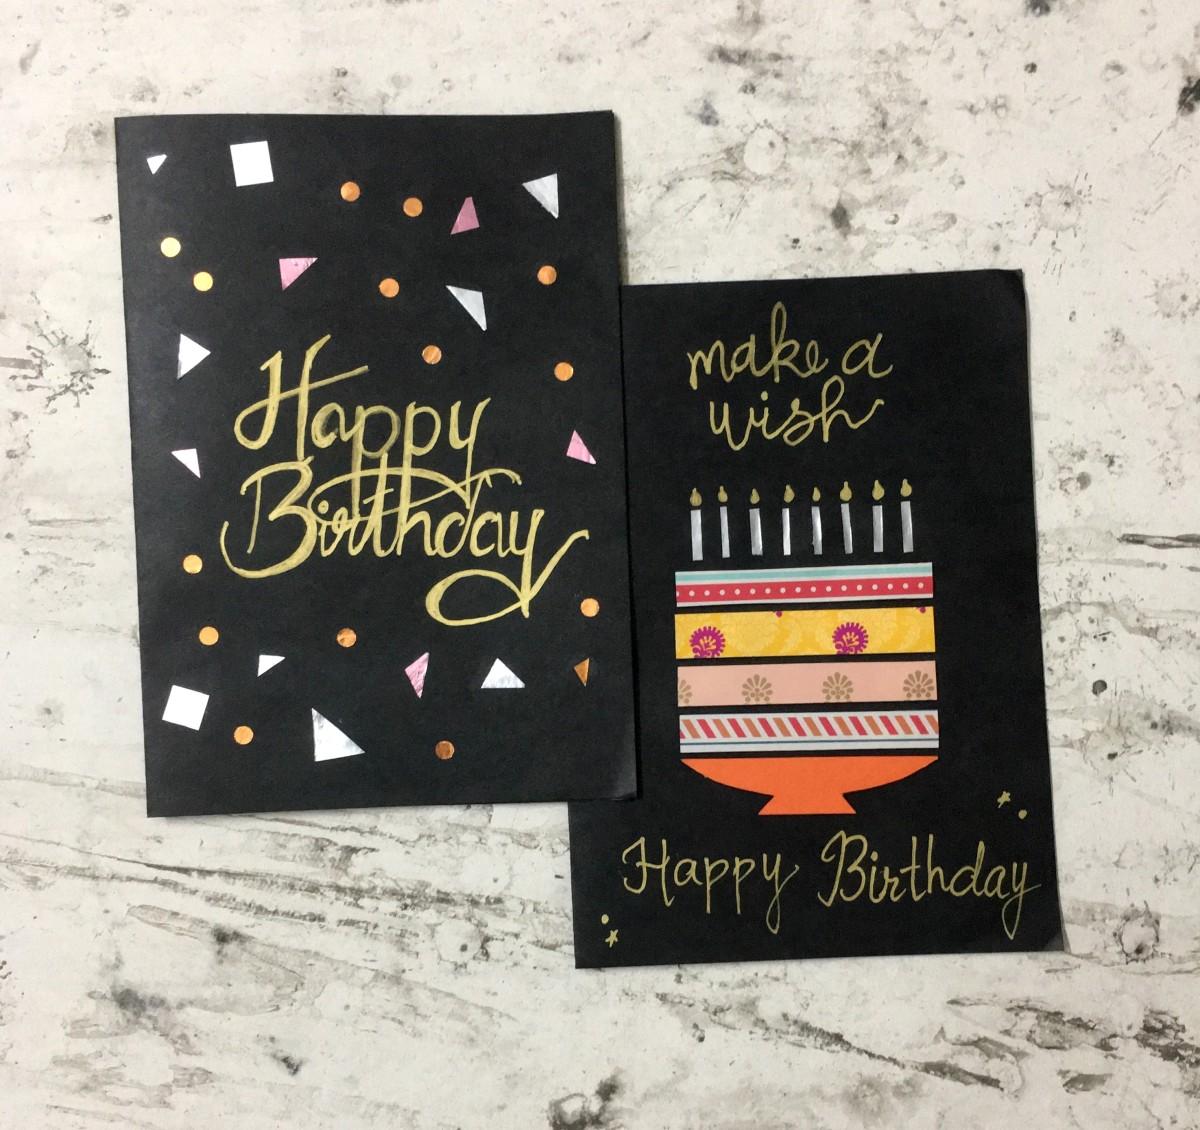 10-Minute DIY Birthday Greeting Cards